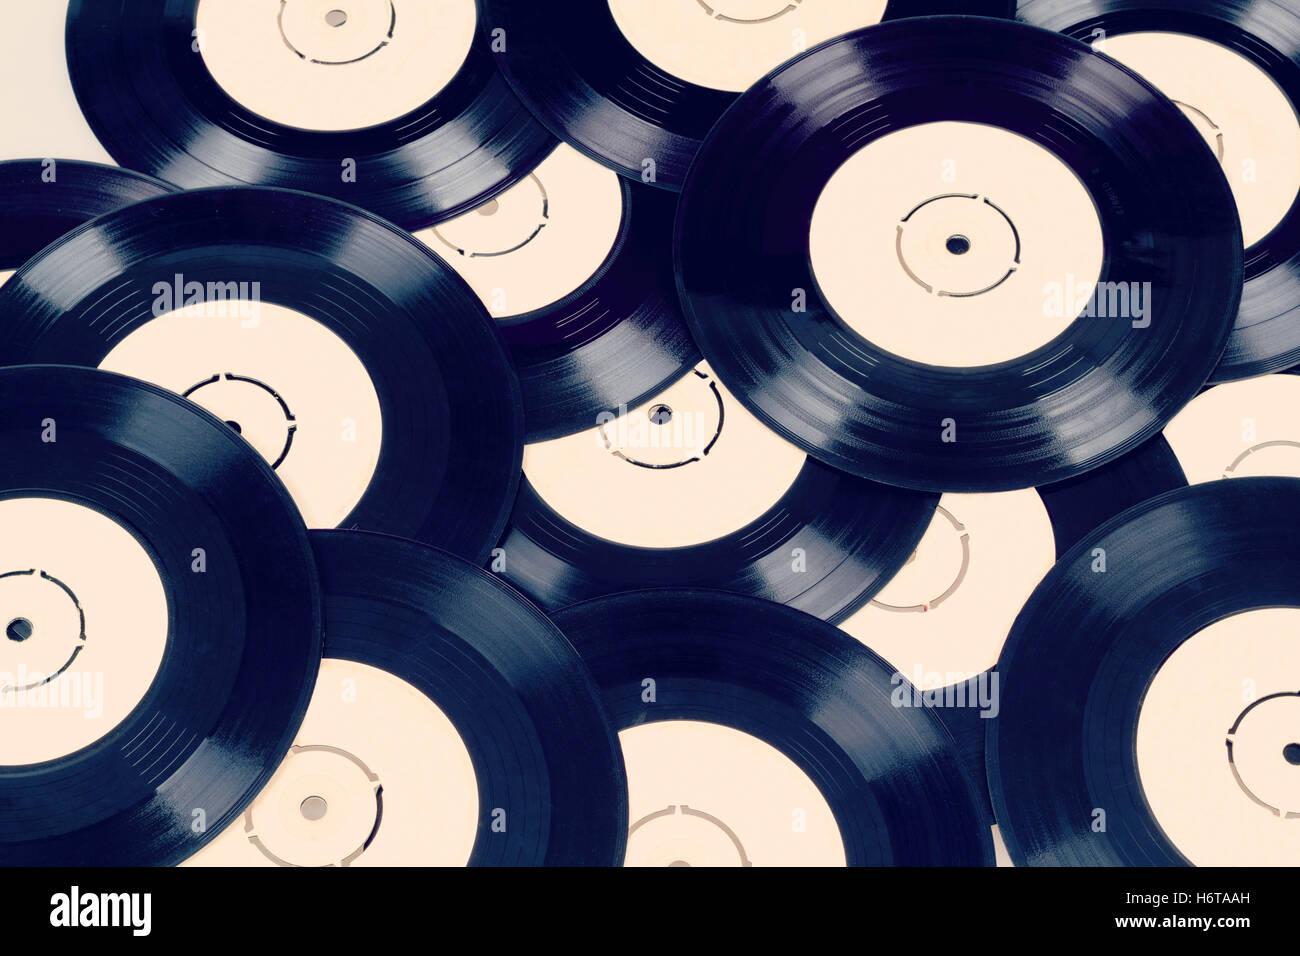 vintage vinyl records photos & vintage vinyl records images - alamy